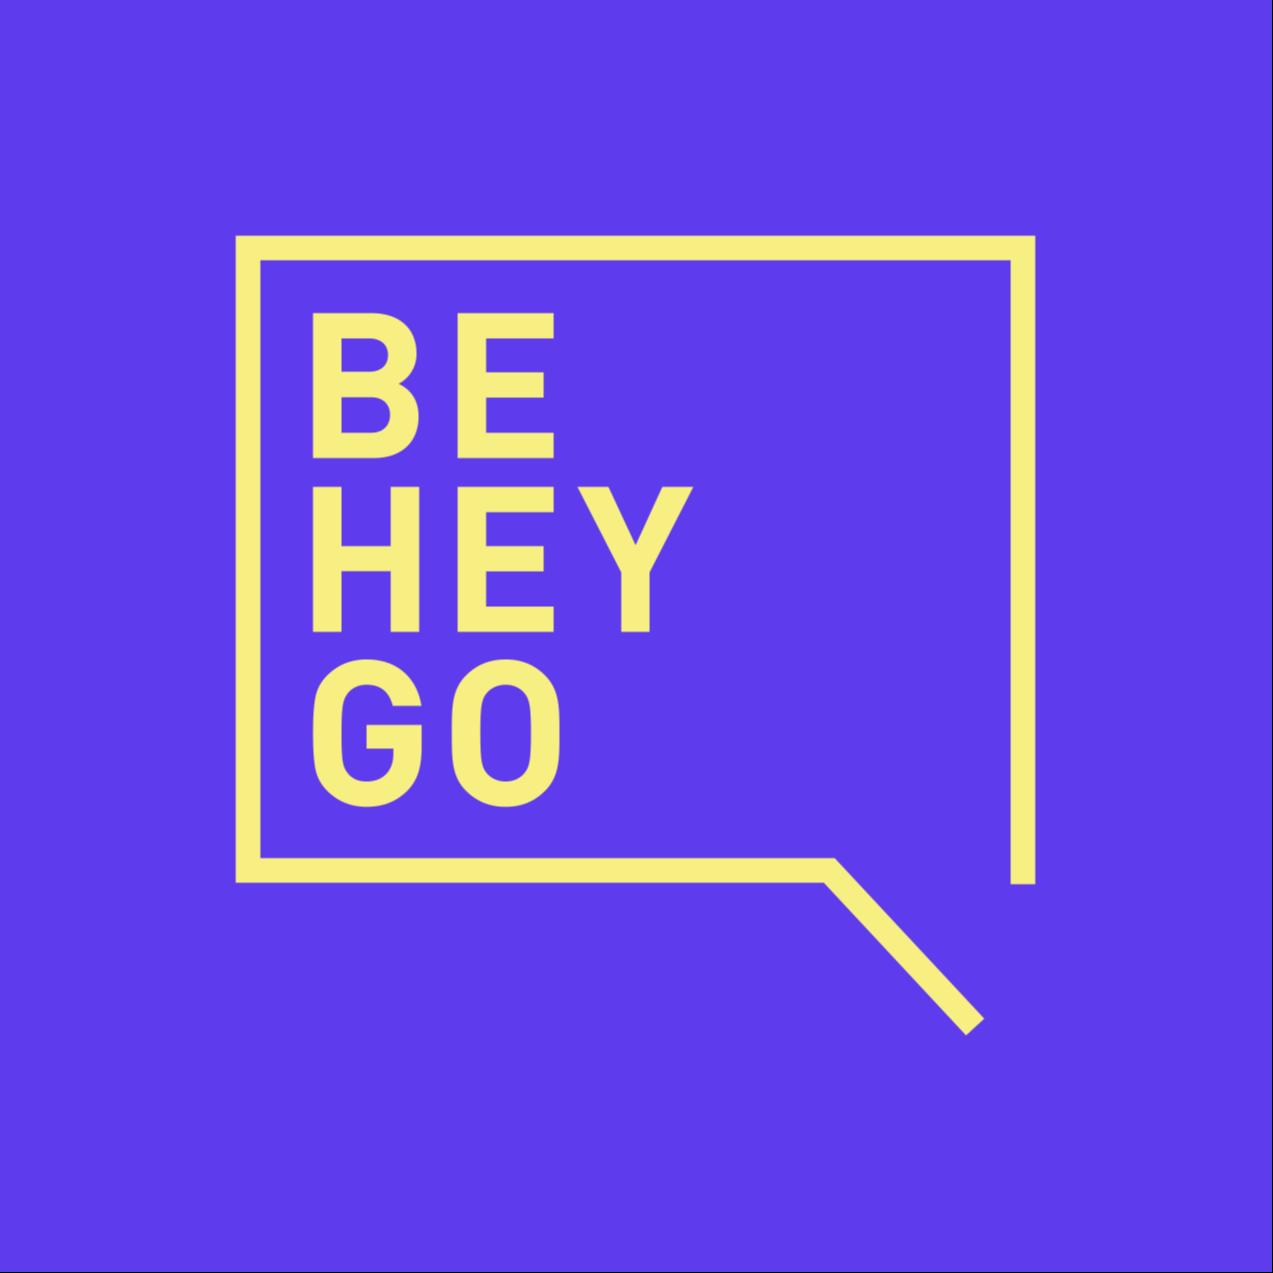 @beheygo Profile Image | Linktree